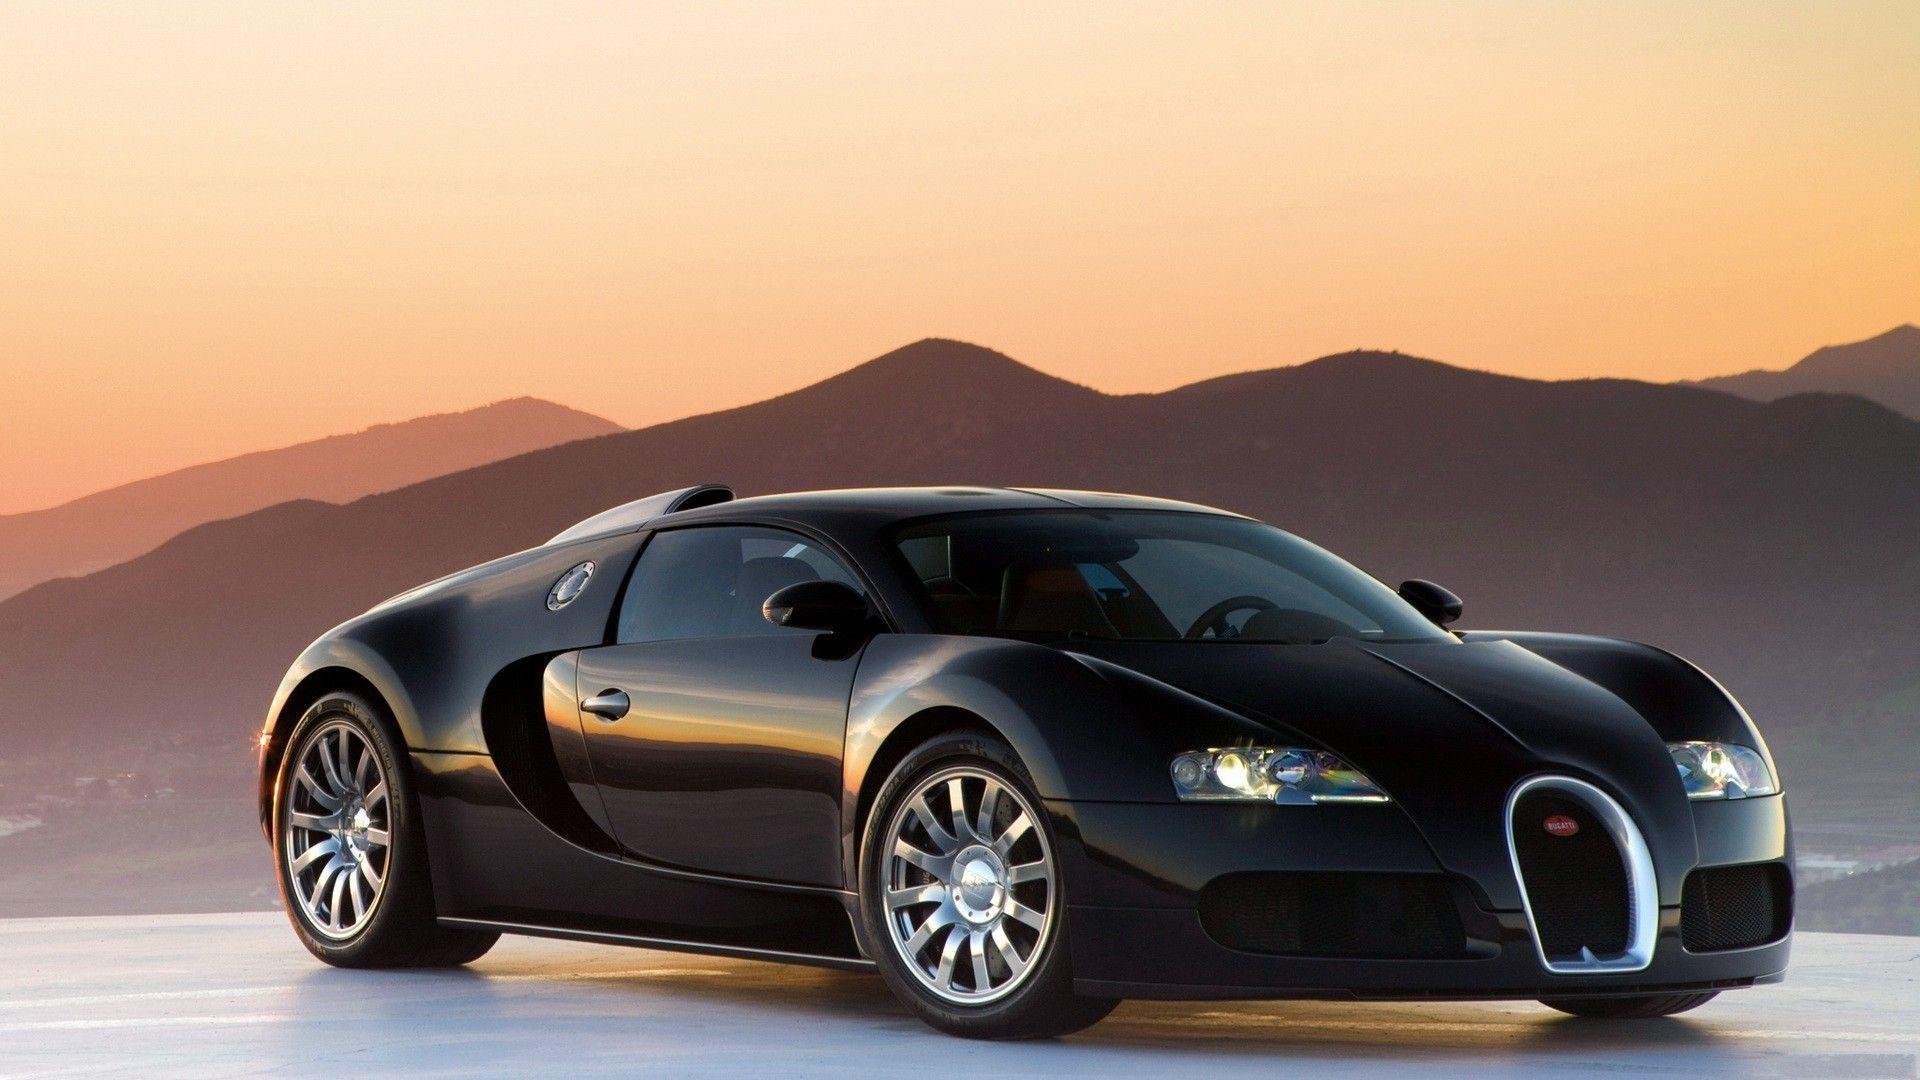 bugatti_veyron_wallpaper_hd_028 Fascinating Bugatti Veyron Price south African Rands Cars Trend